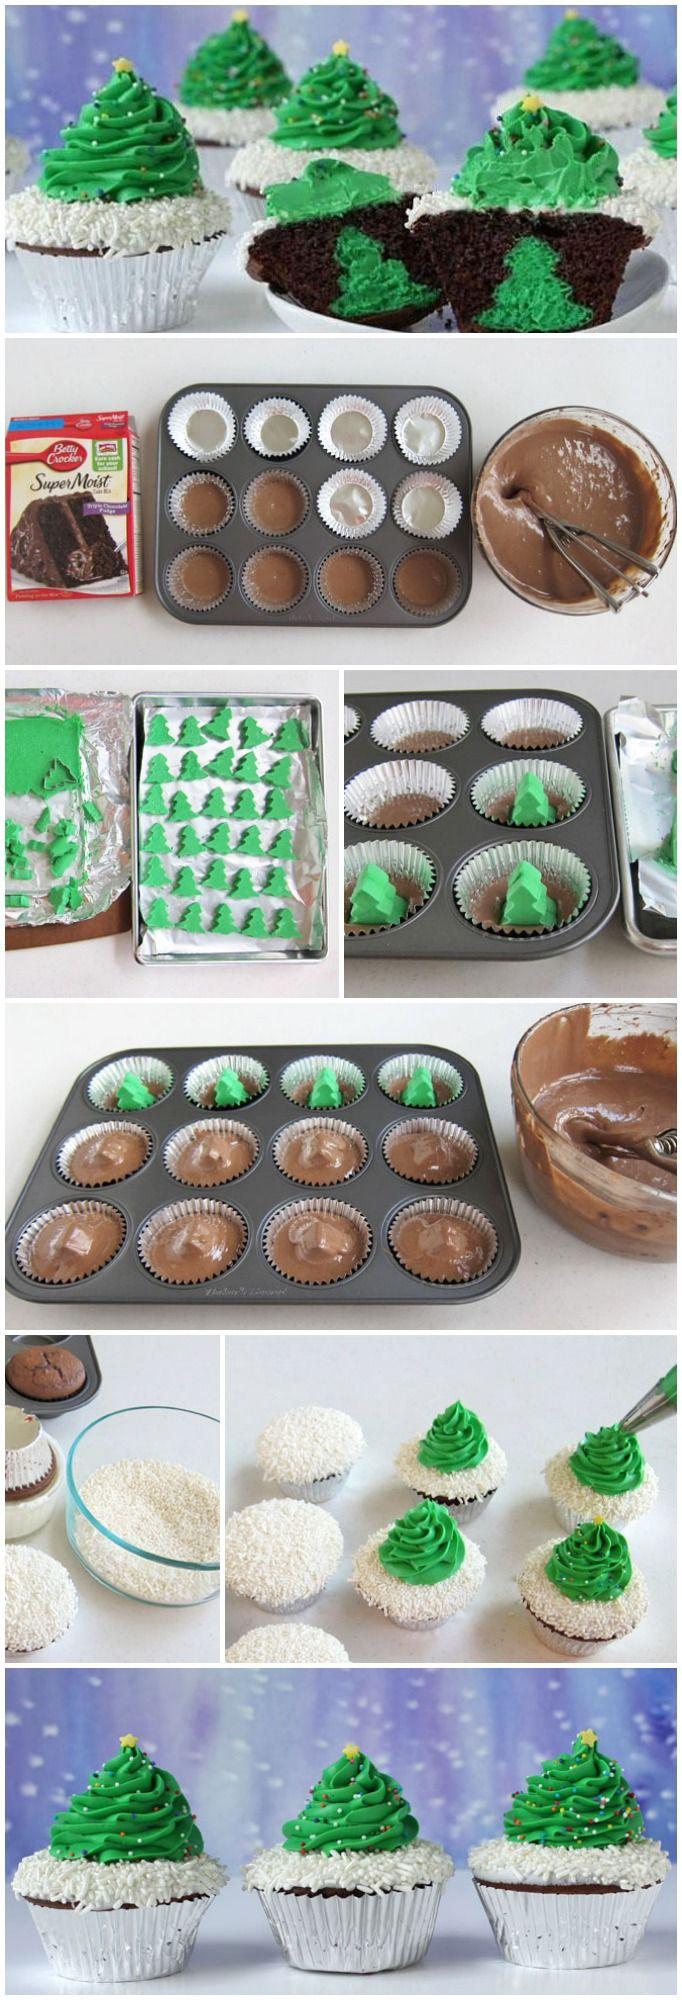 Christmas Tree Cheesecake Stuffed Cupcakes Recipe